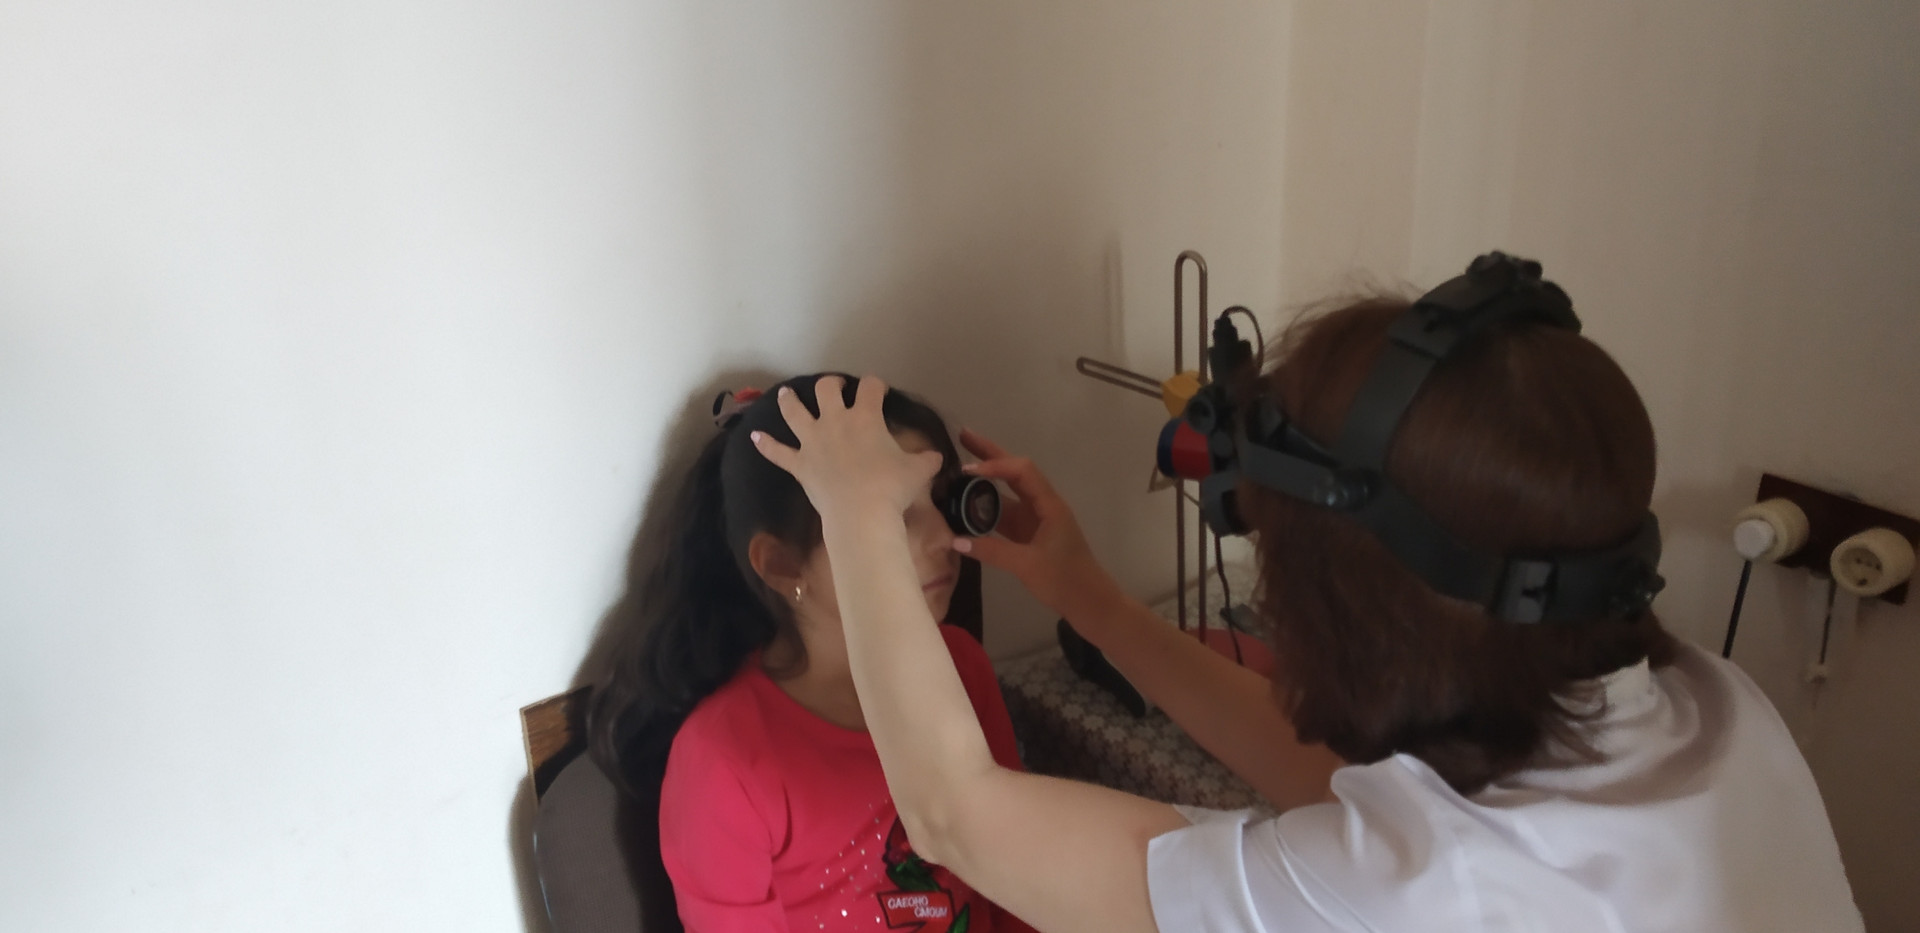 Офтальмоскоп налобный бинокулярный.jpg